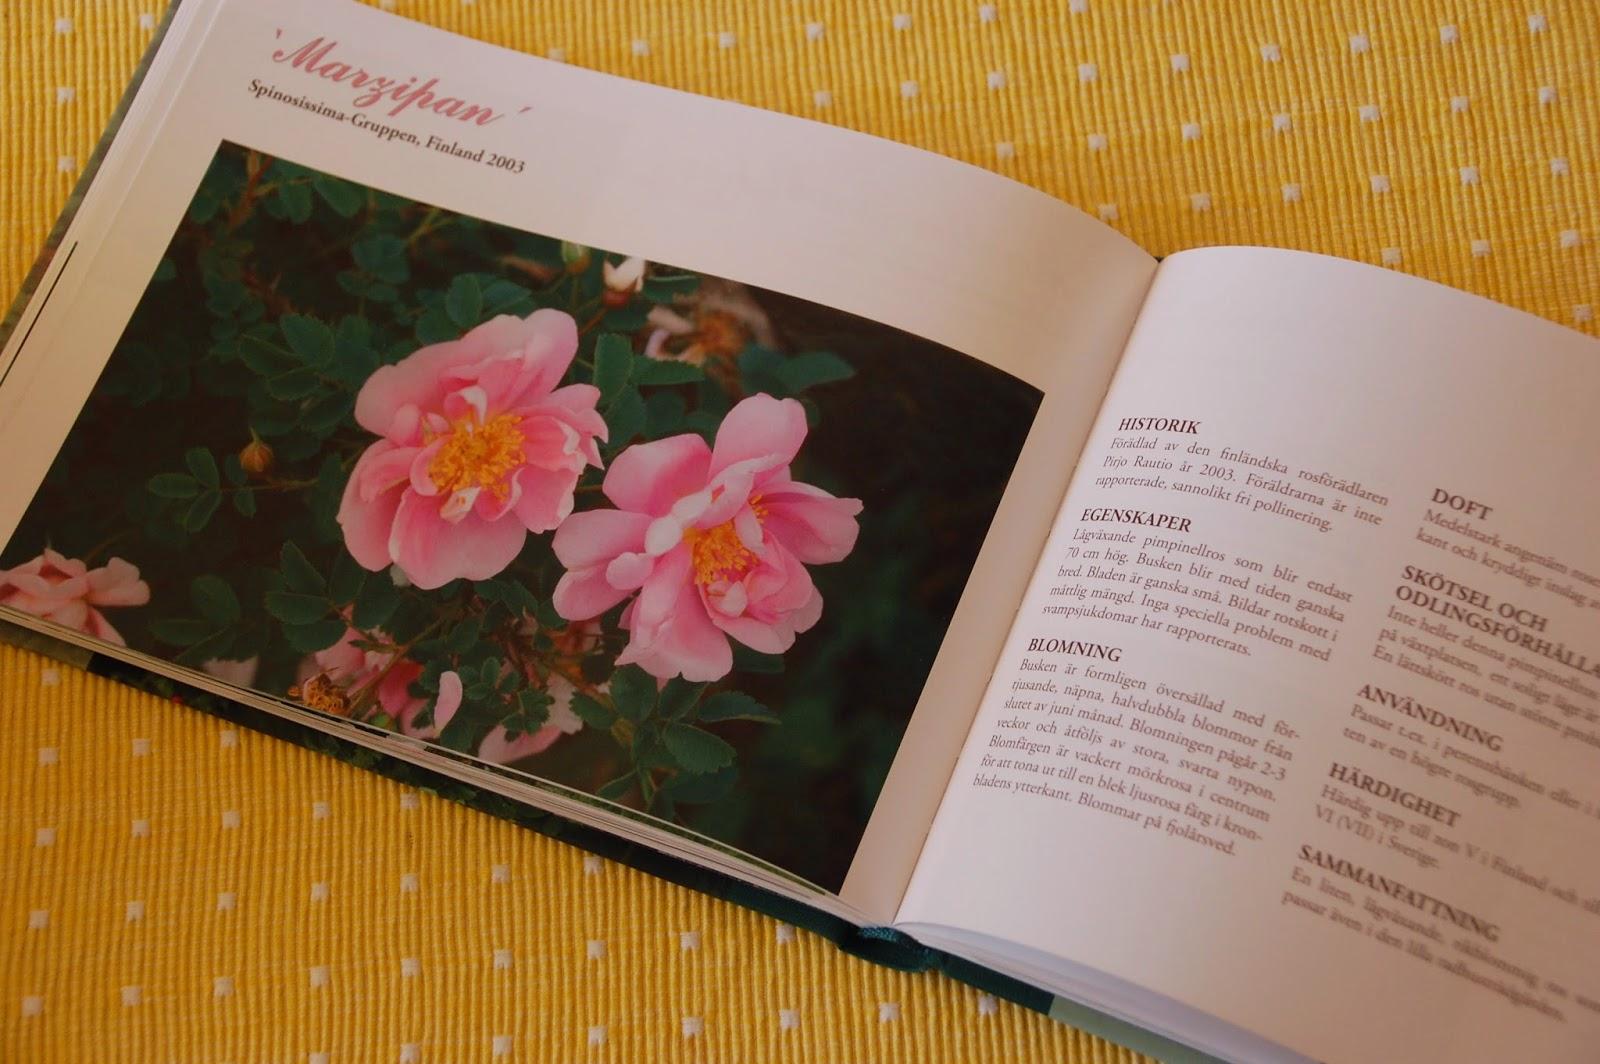 Svanå trädgård: rosor i norr.